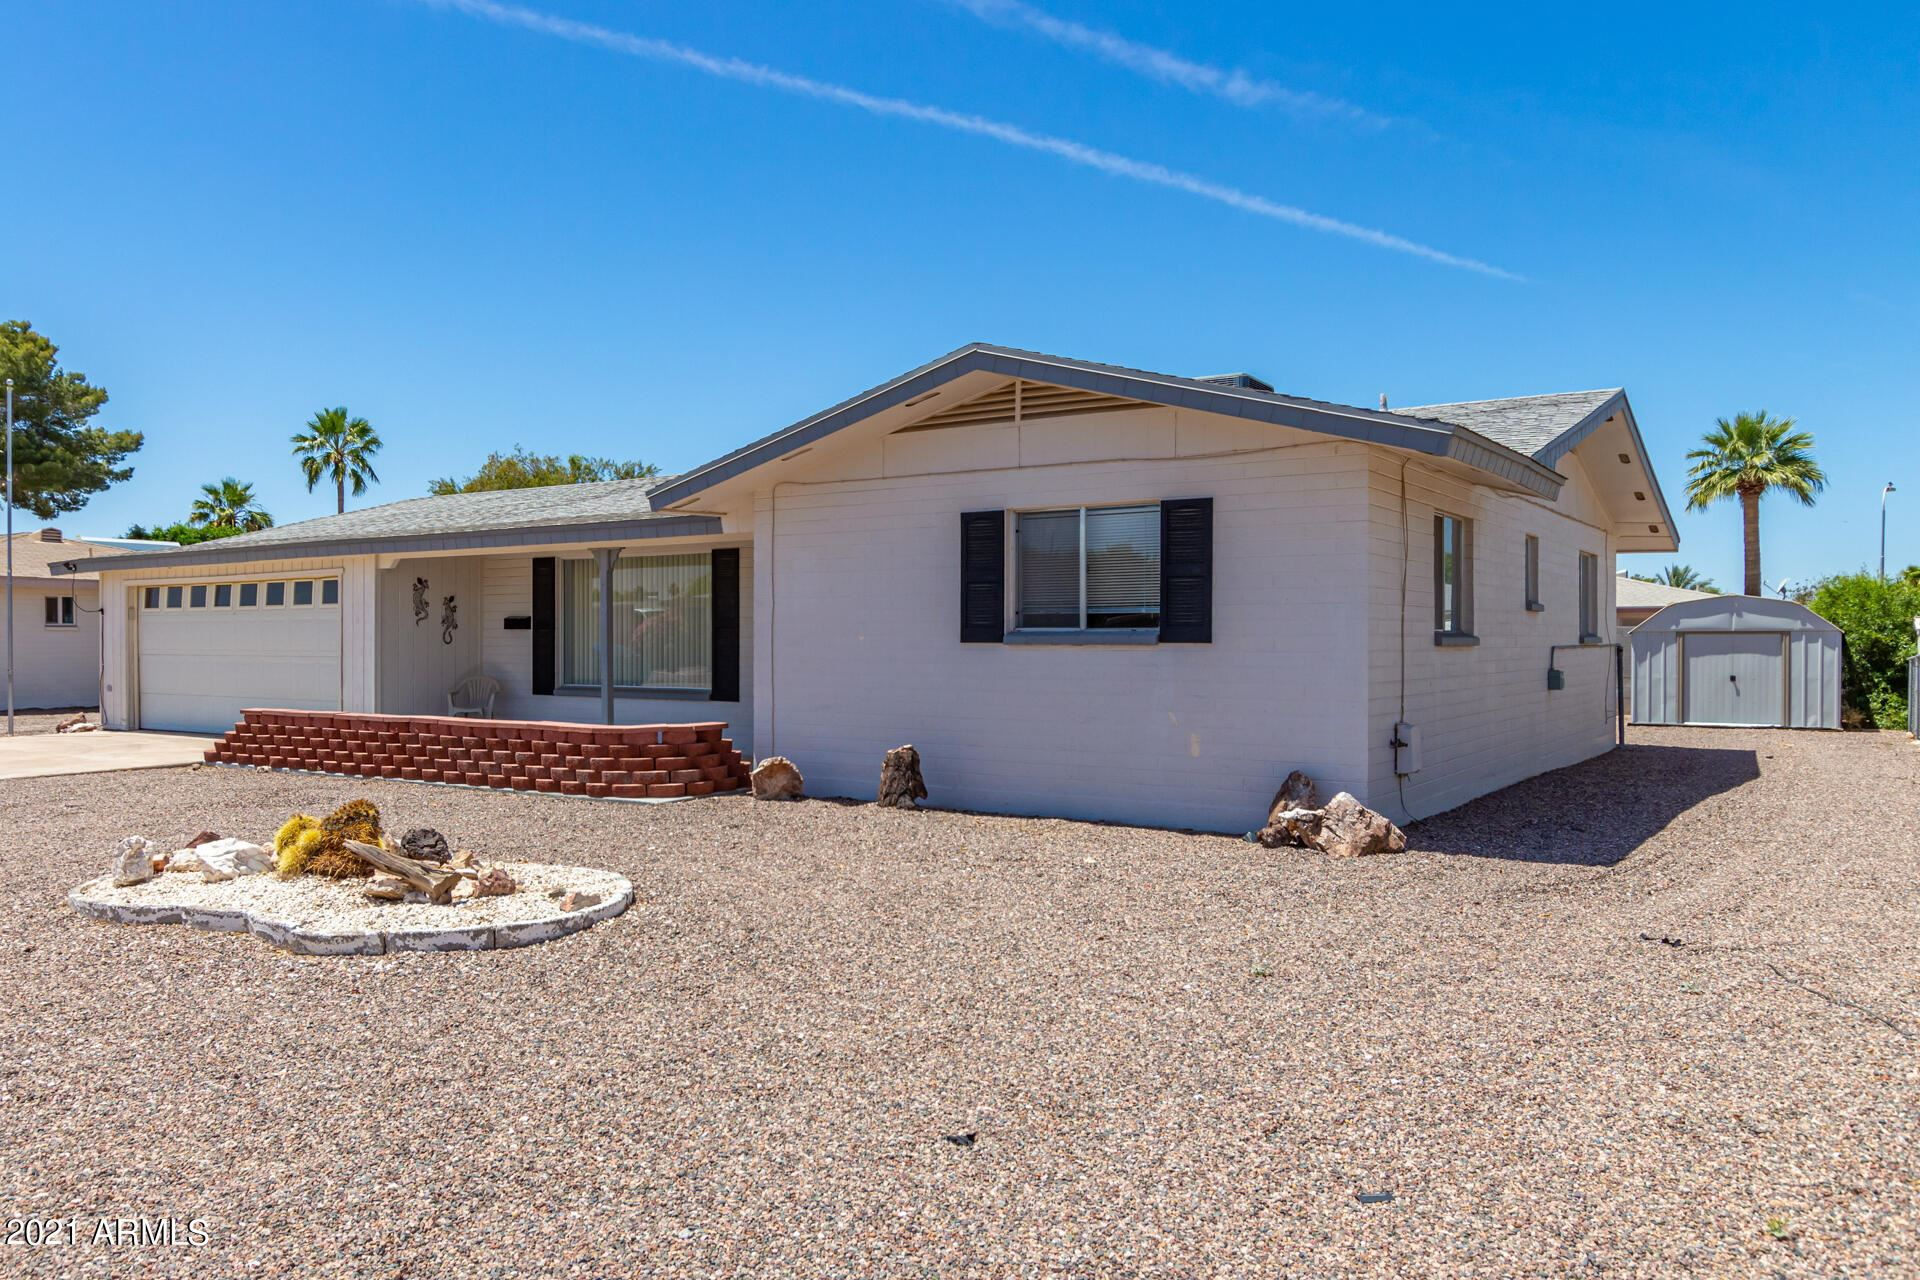 Photo of 734 N 58TH Street, Mesa, AZ 85205 (MLS # 6232467)